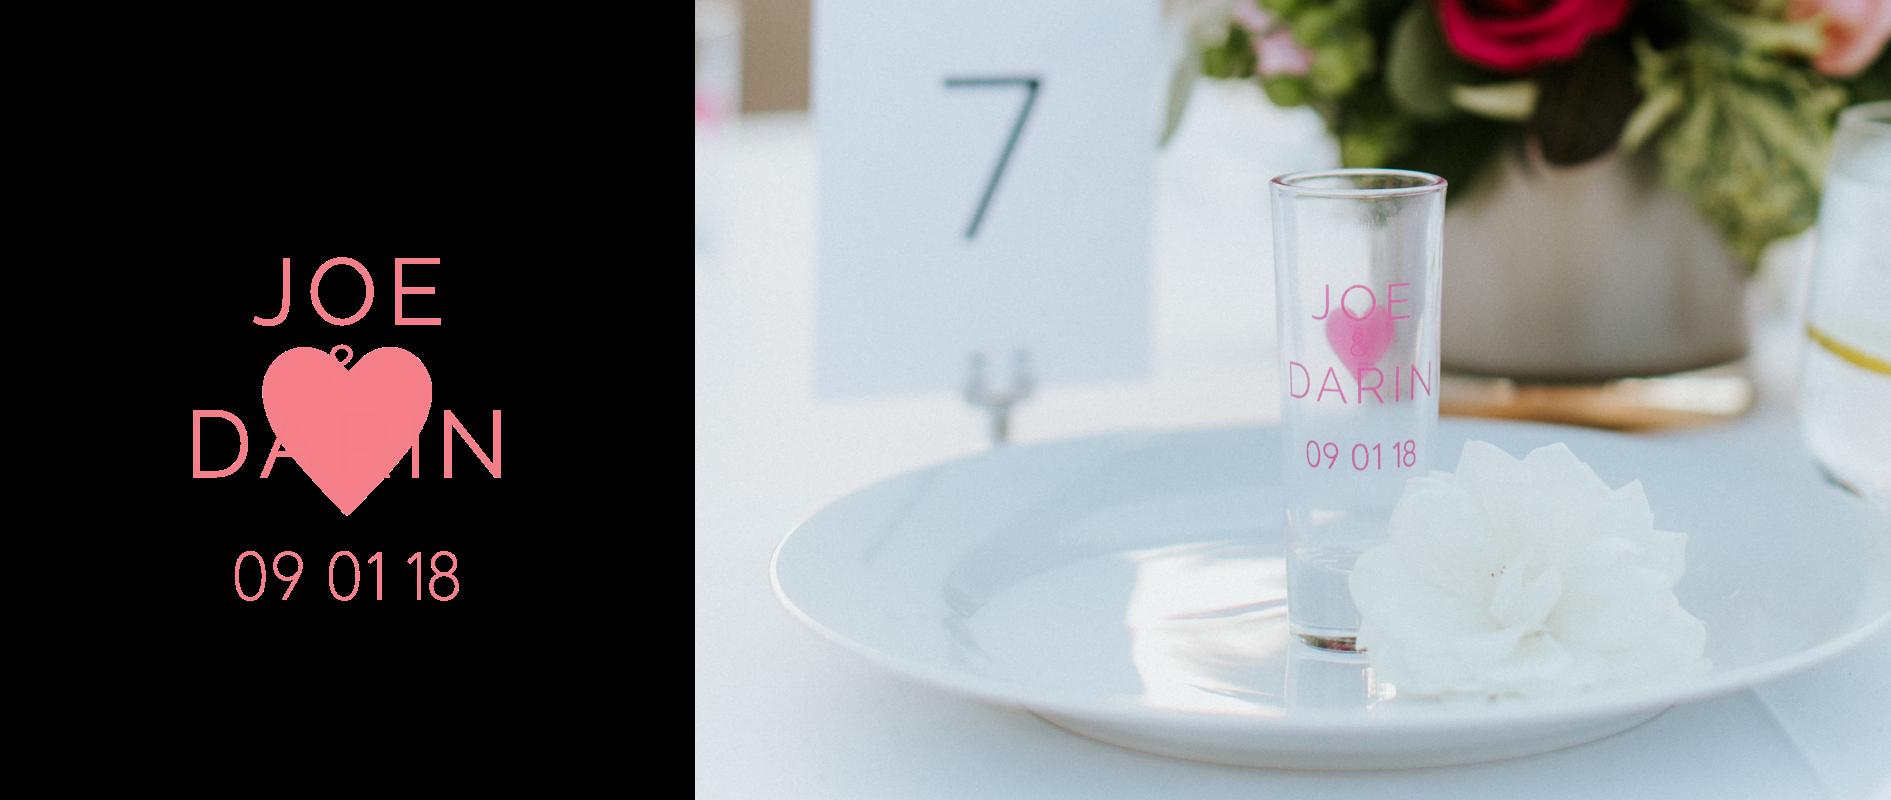 Custom double shot glass that reads JOE & DARIN 09 01 18